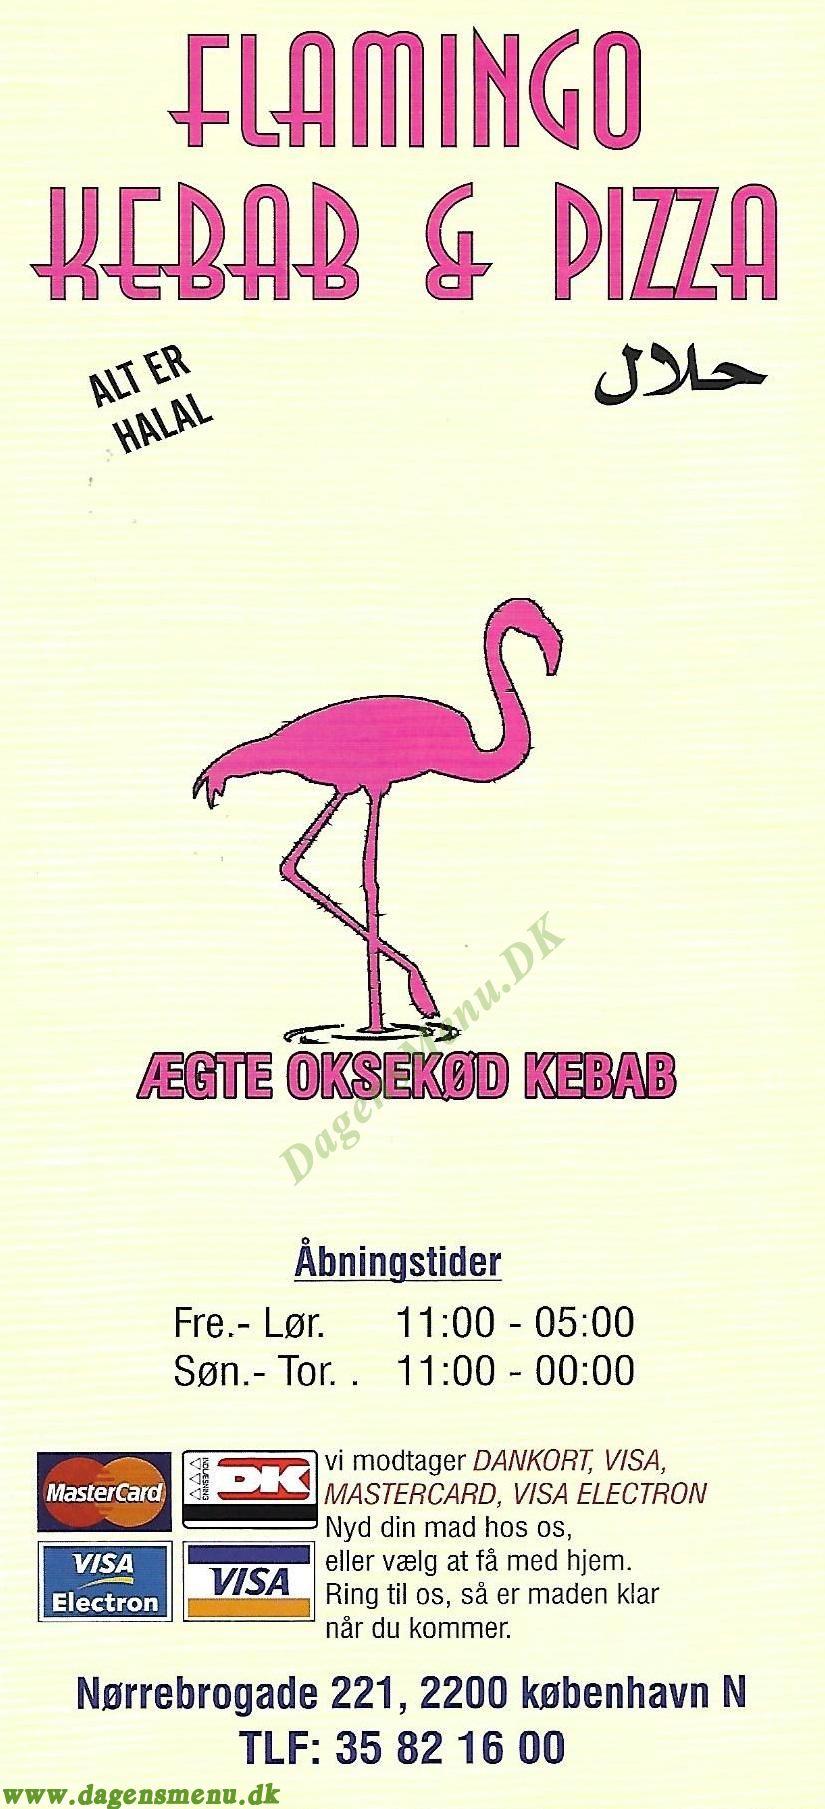 Flamingo Kebab og Pizzaria - Menukort